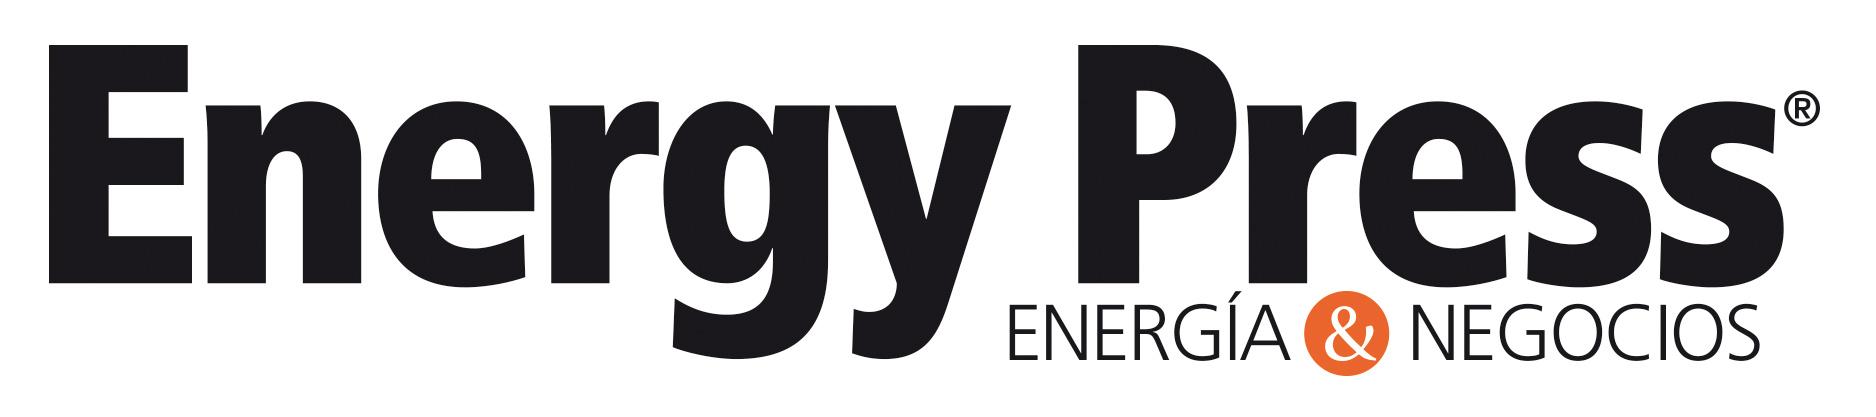 Energy Press